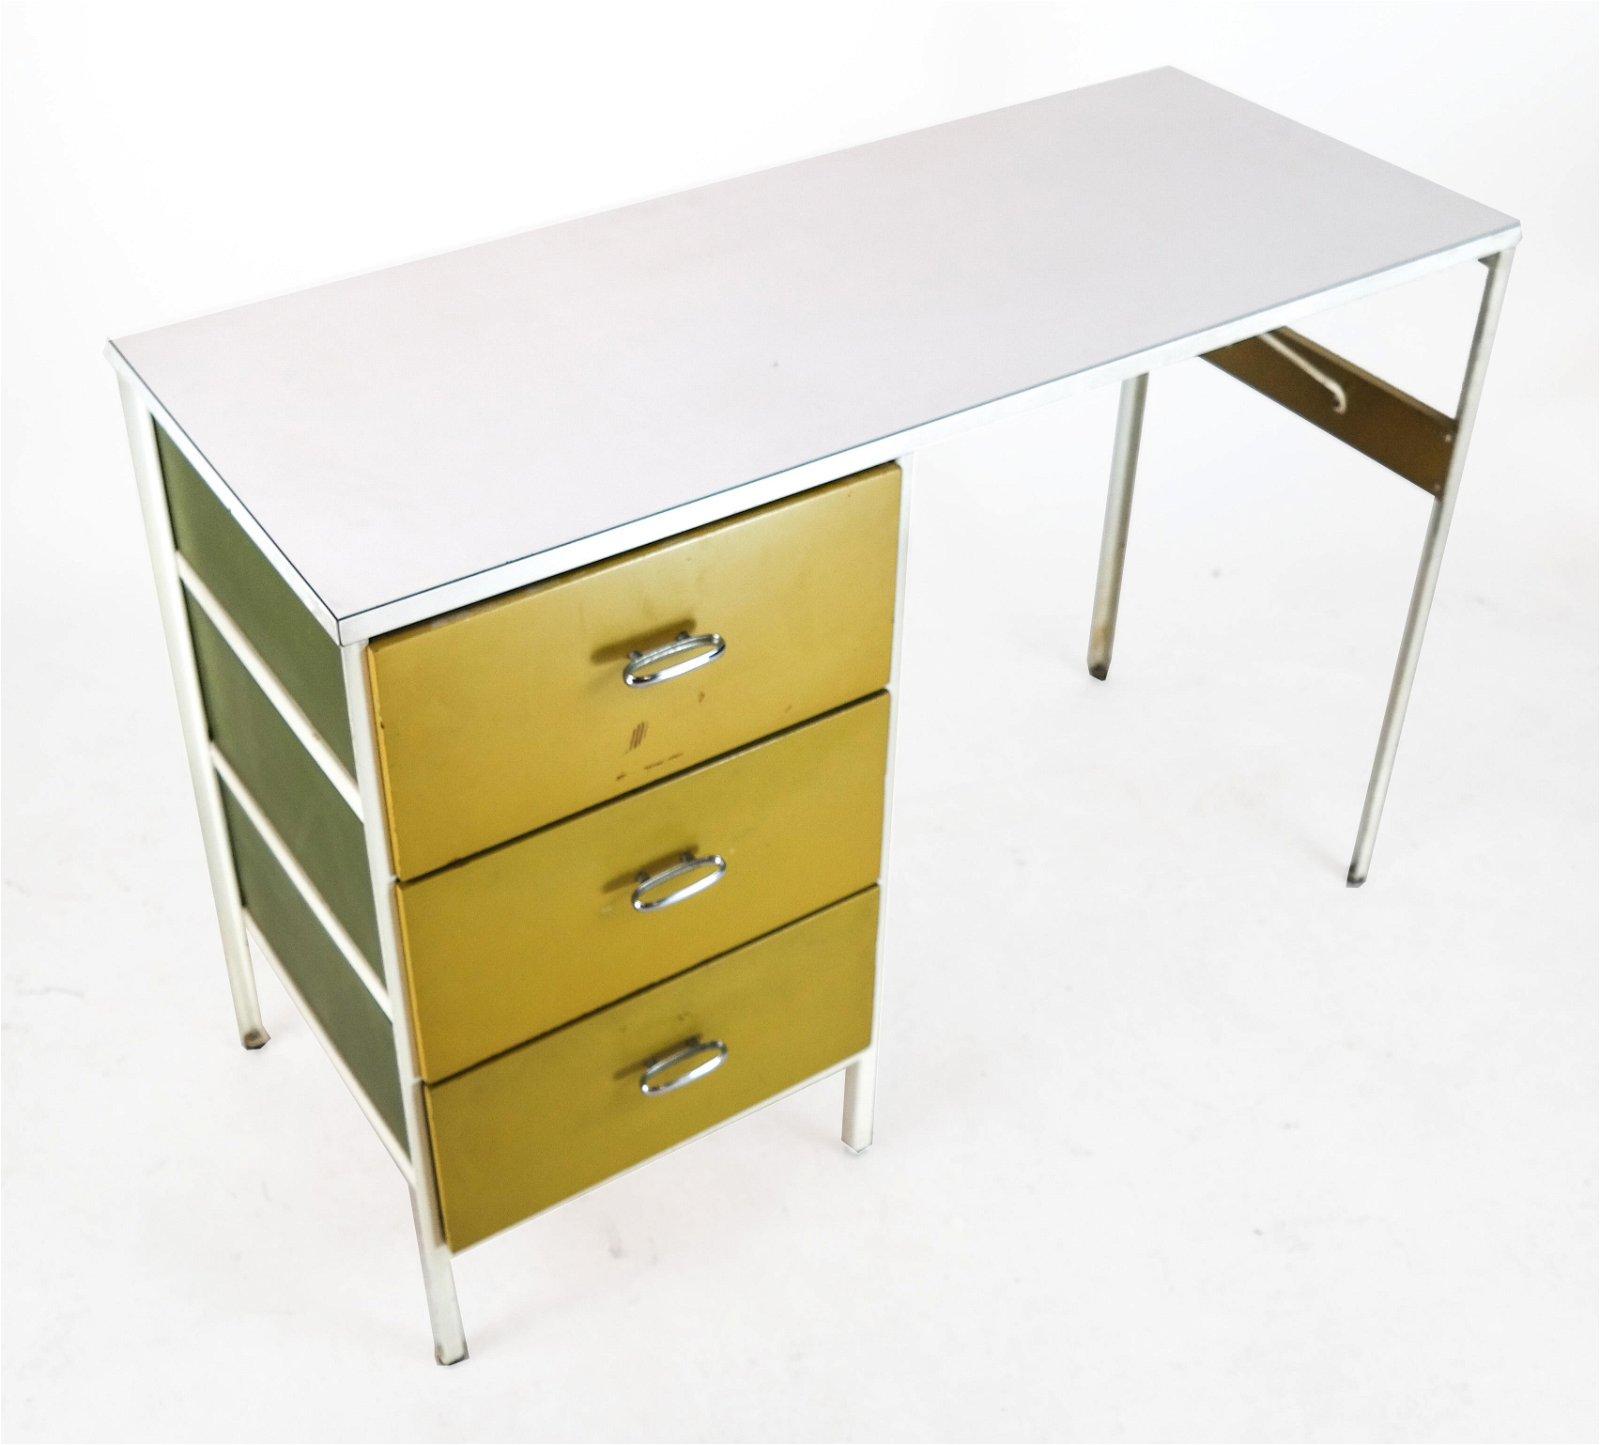 Herman Miller Desk - George Nelson Design